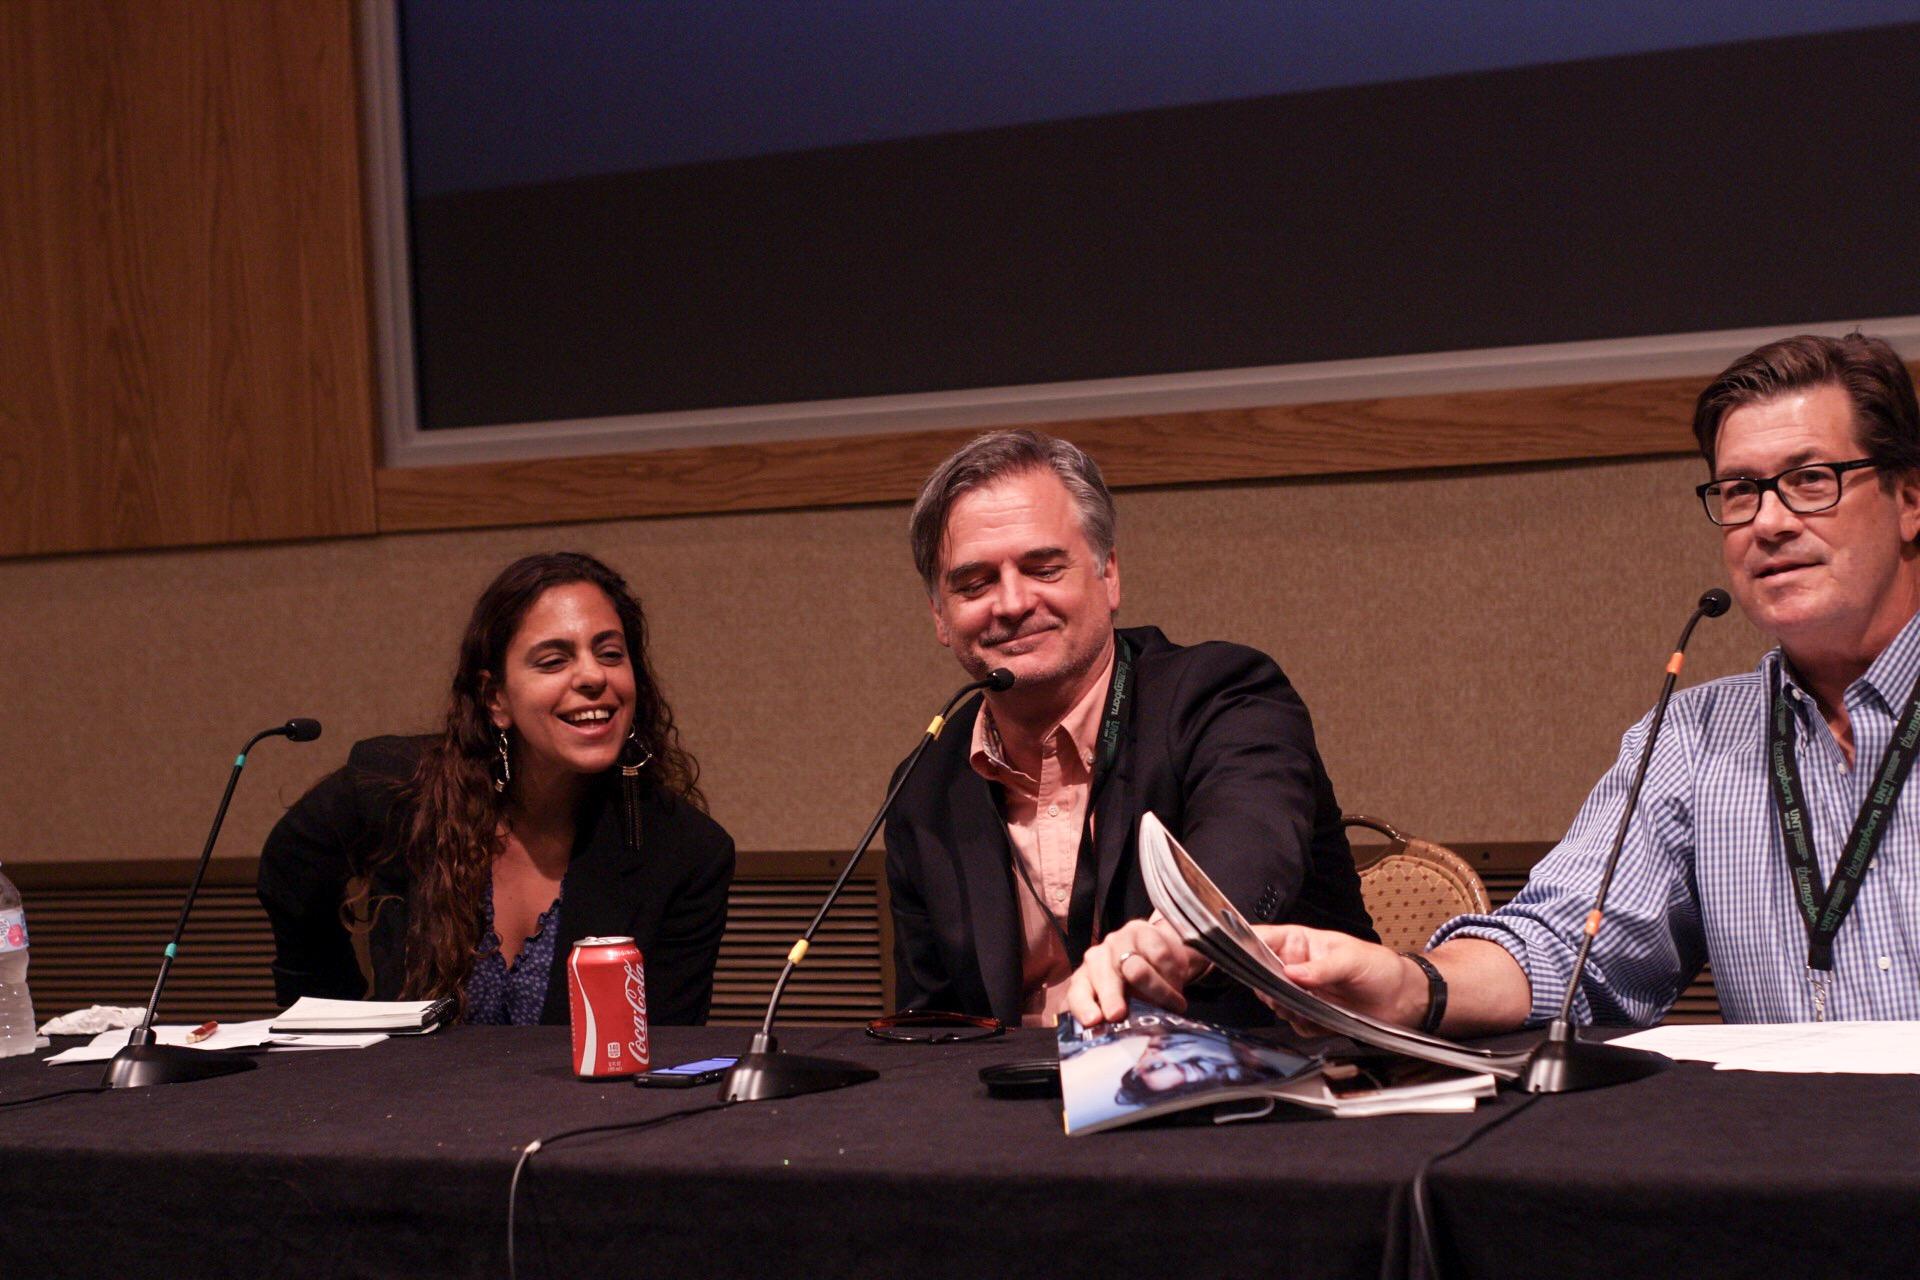 From left to right: Vanessa Grigoriadis, Stephen Rodrick, Skip Hollandsworth